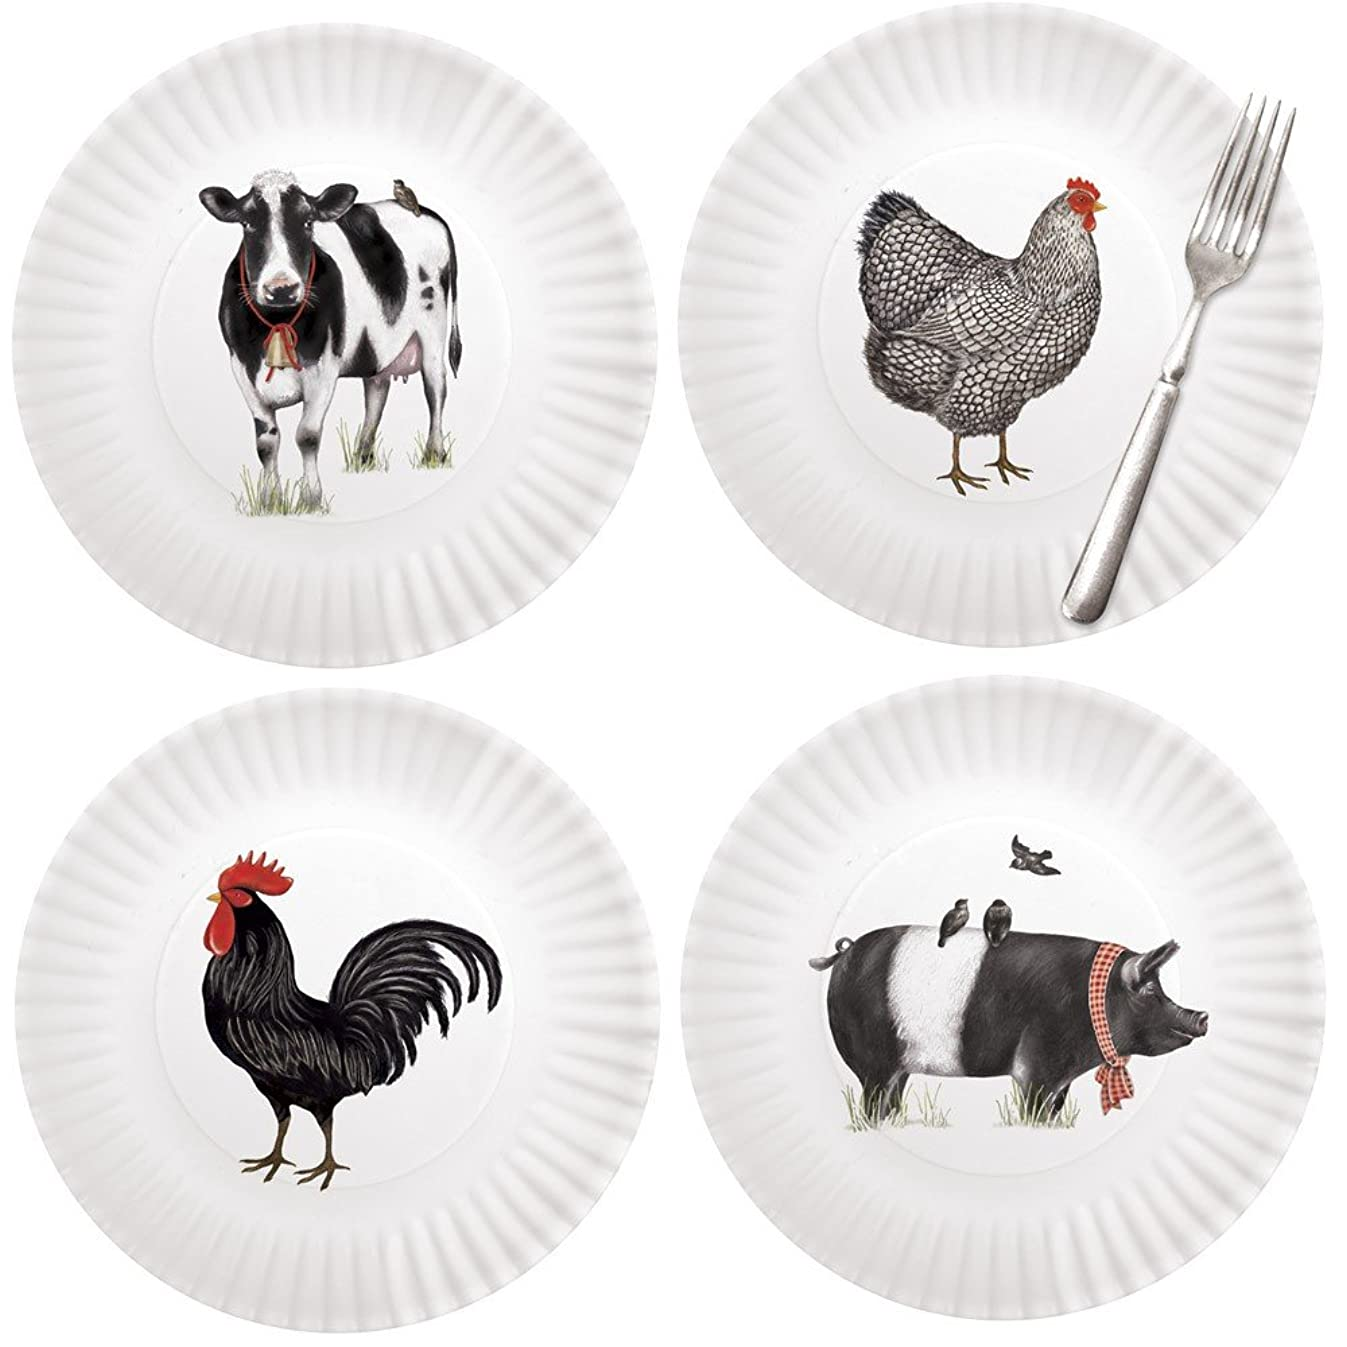 Mary Lake-Thompson Farmhouse Animals 9-inch Melamine Plates, Set of 4